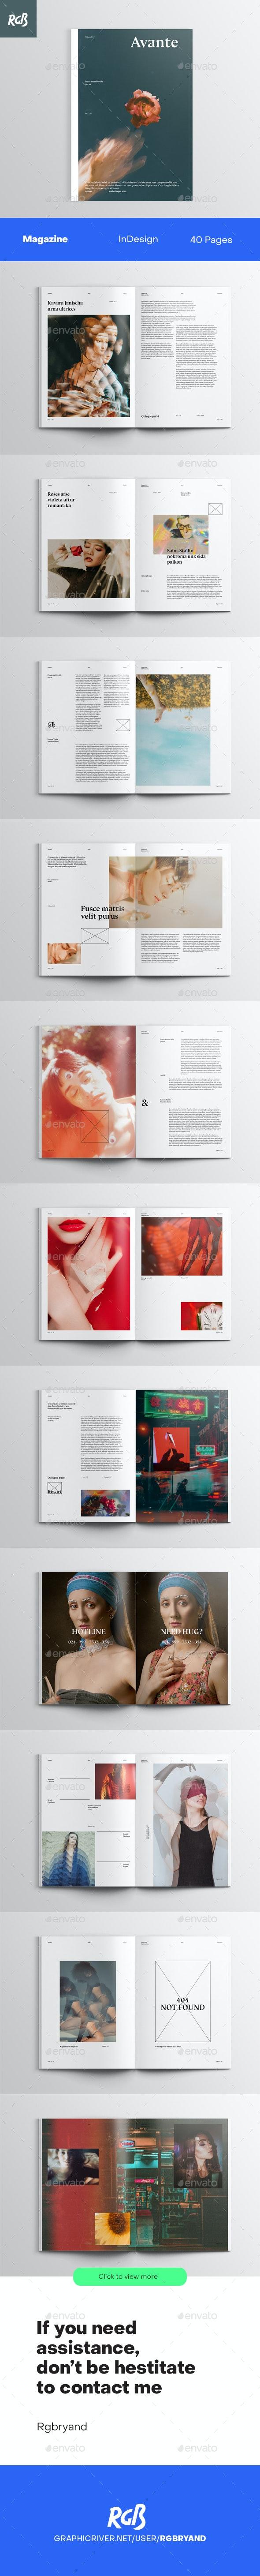 Avante Editorial Magazine - Magazines Print Templates